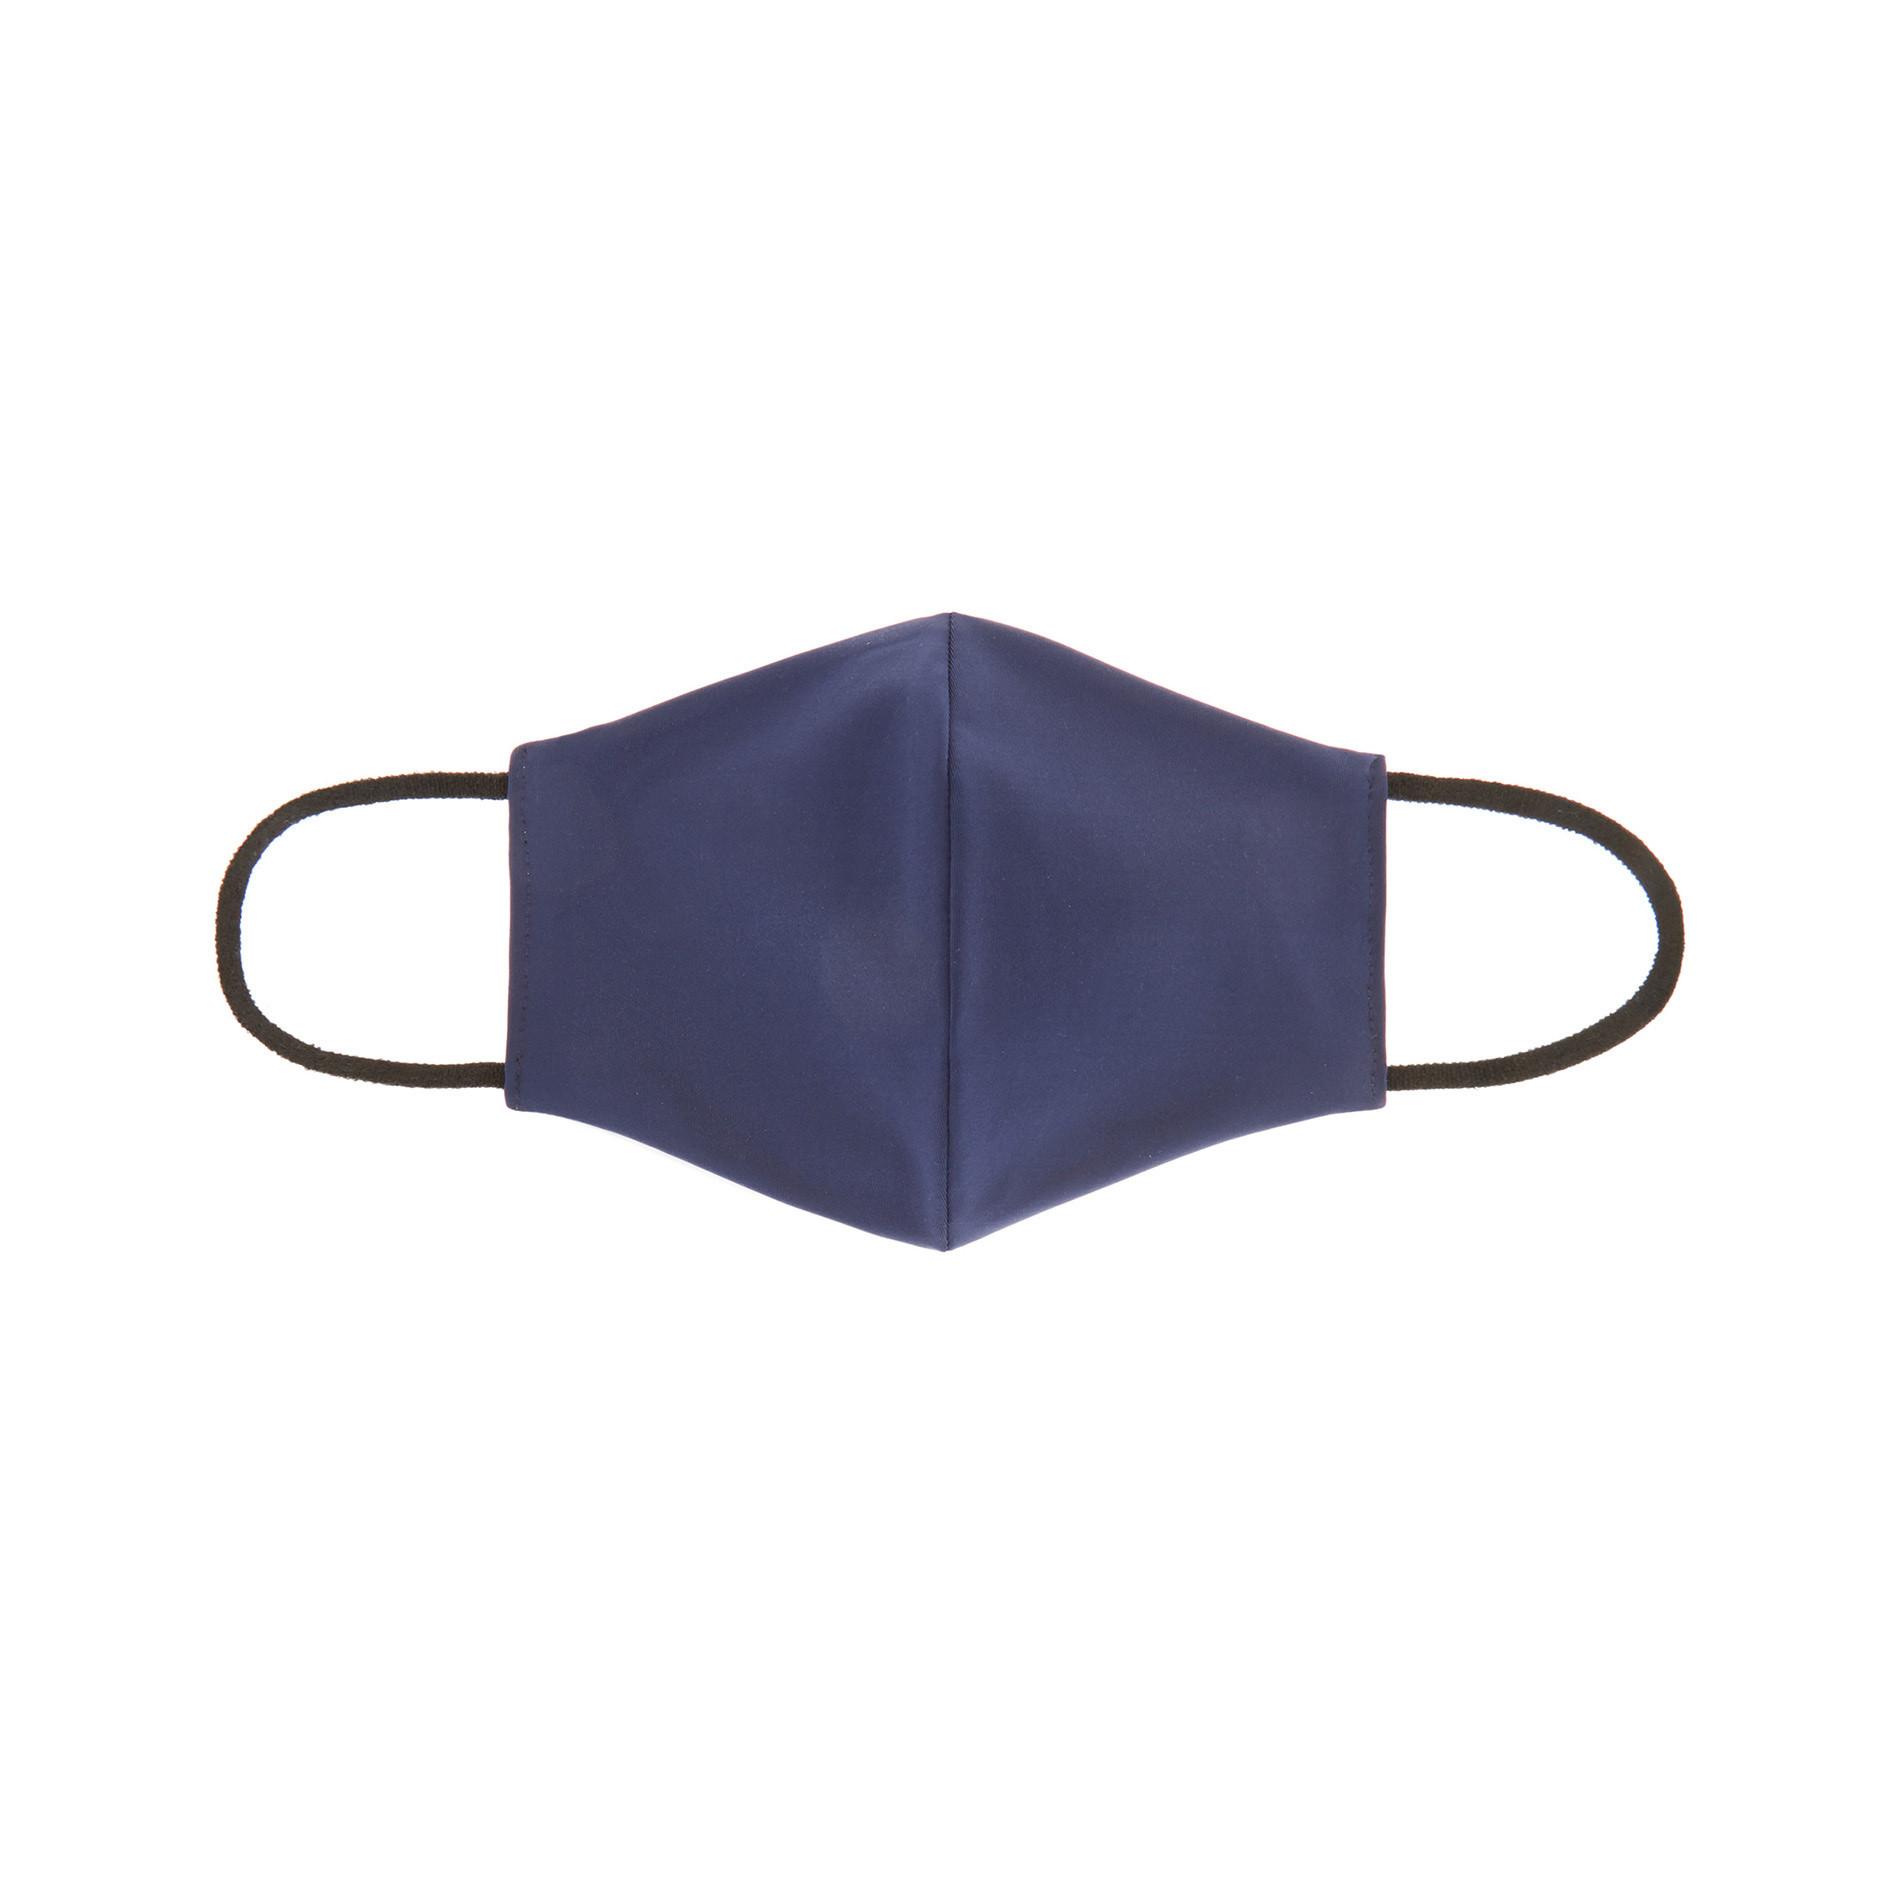 Mascherina bimbo lavabile tessuto tinta unita, Blu, large image number 0